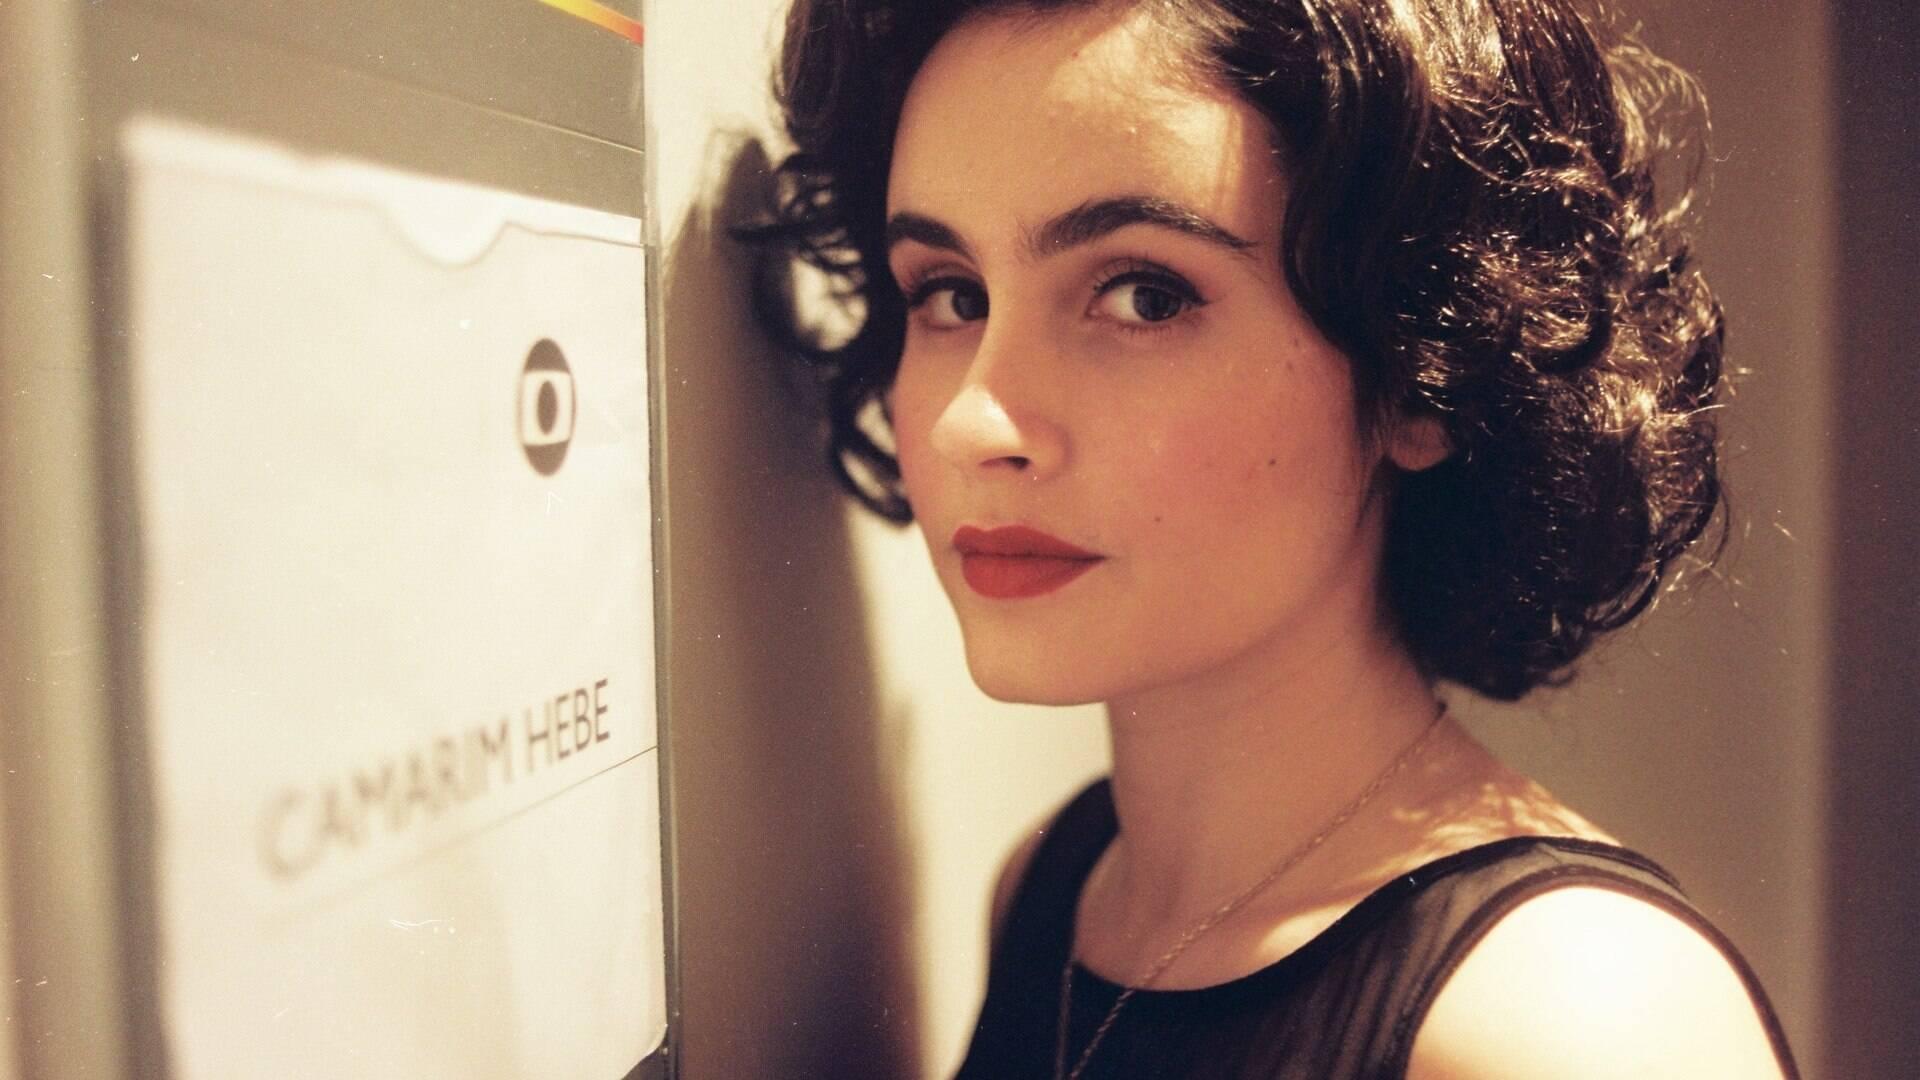 Andreia Beltrao Nua valentina herszage interpreta hebe camargo na juventude - fa